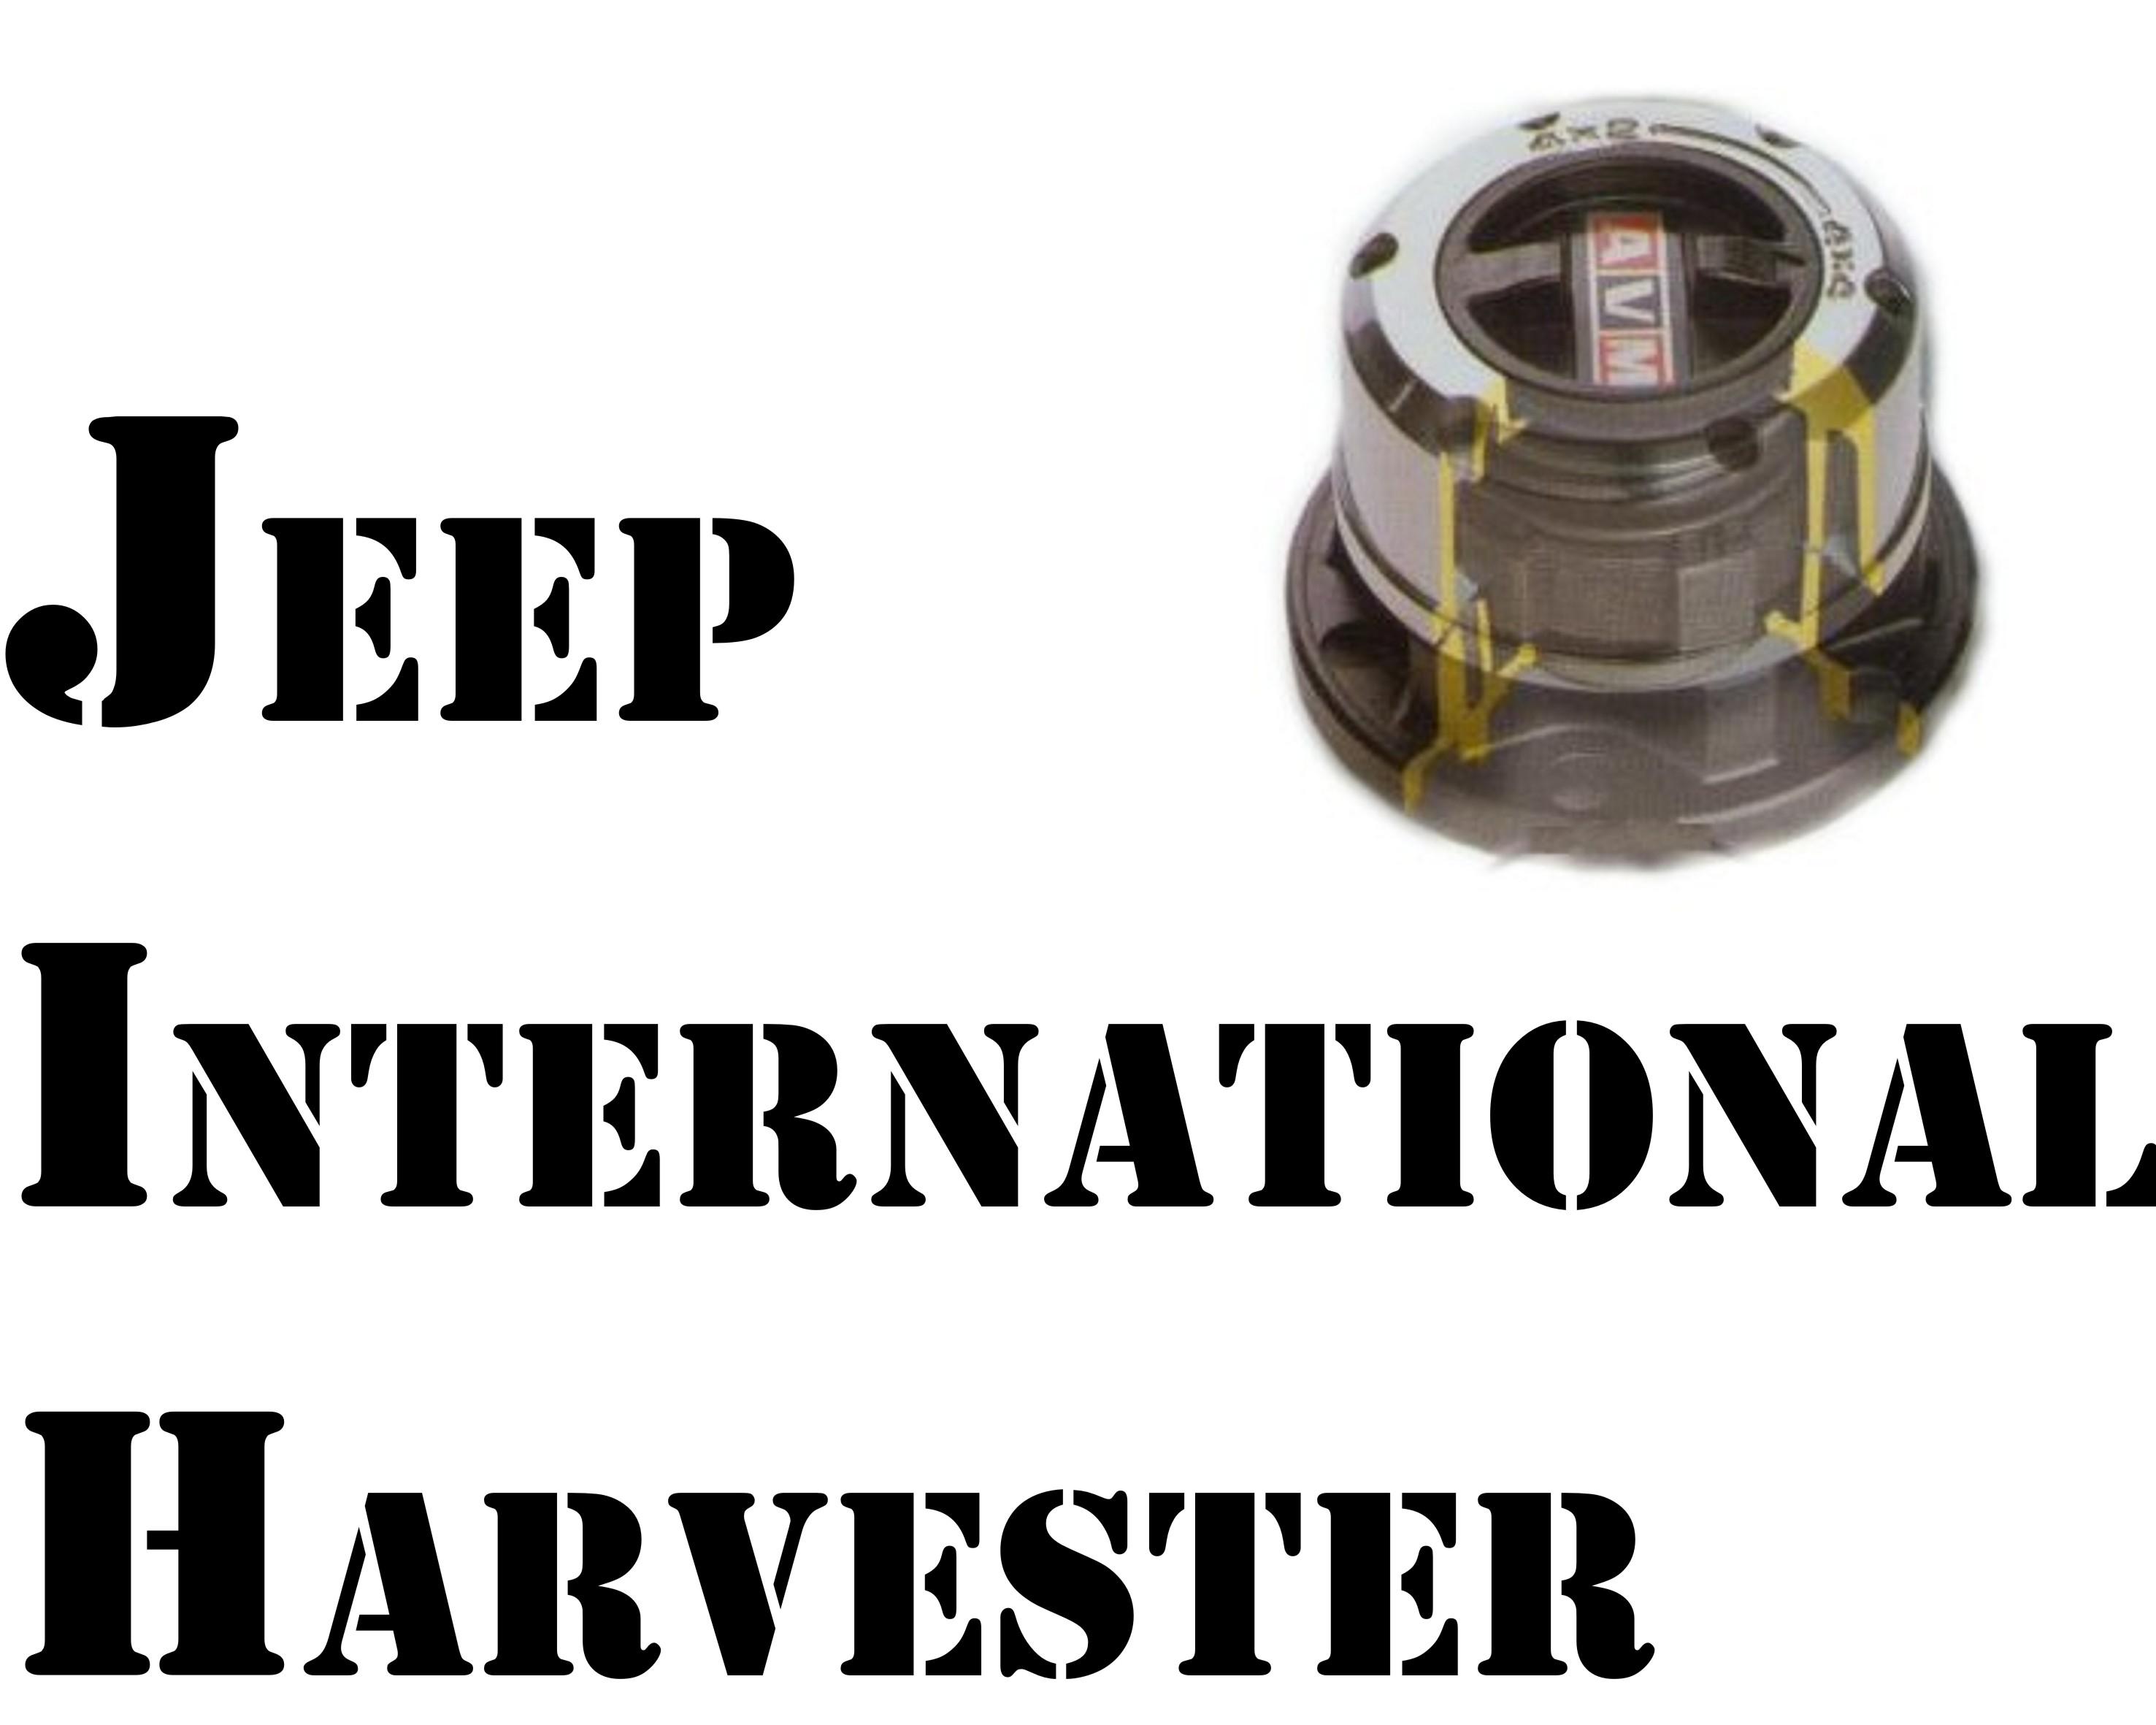 JEEP / INTERNATIONAL